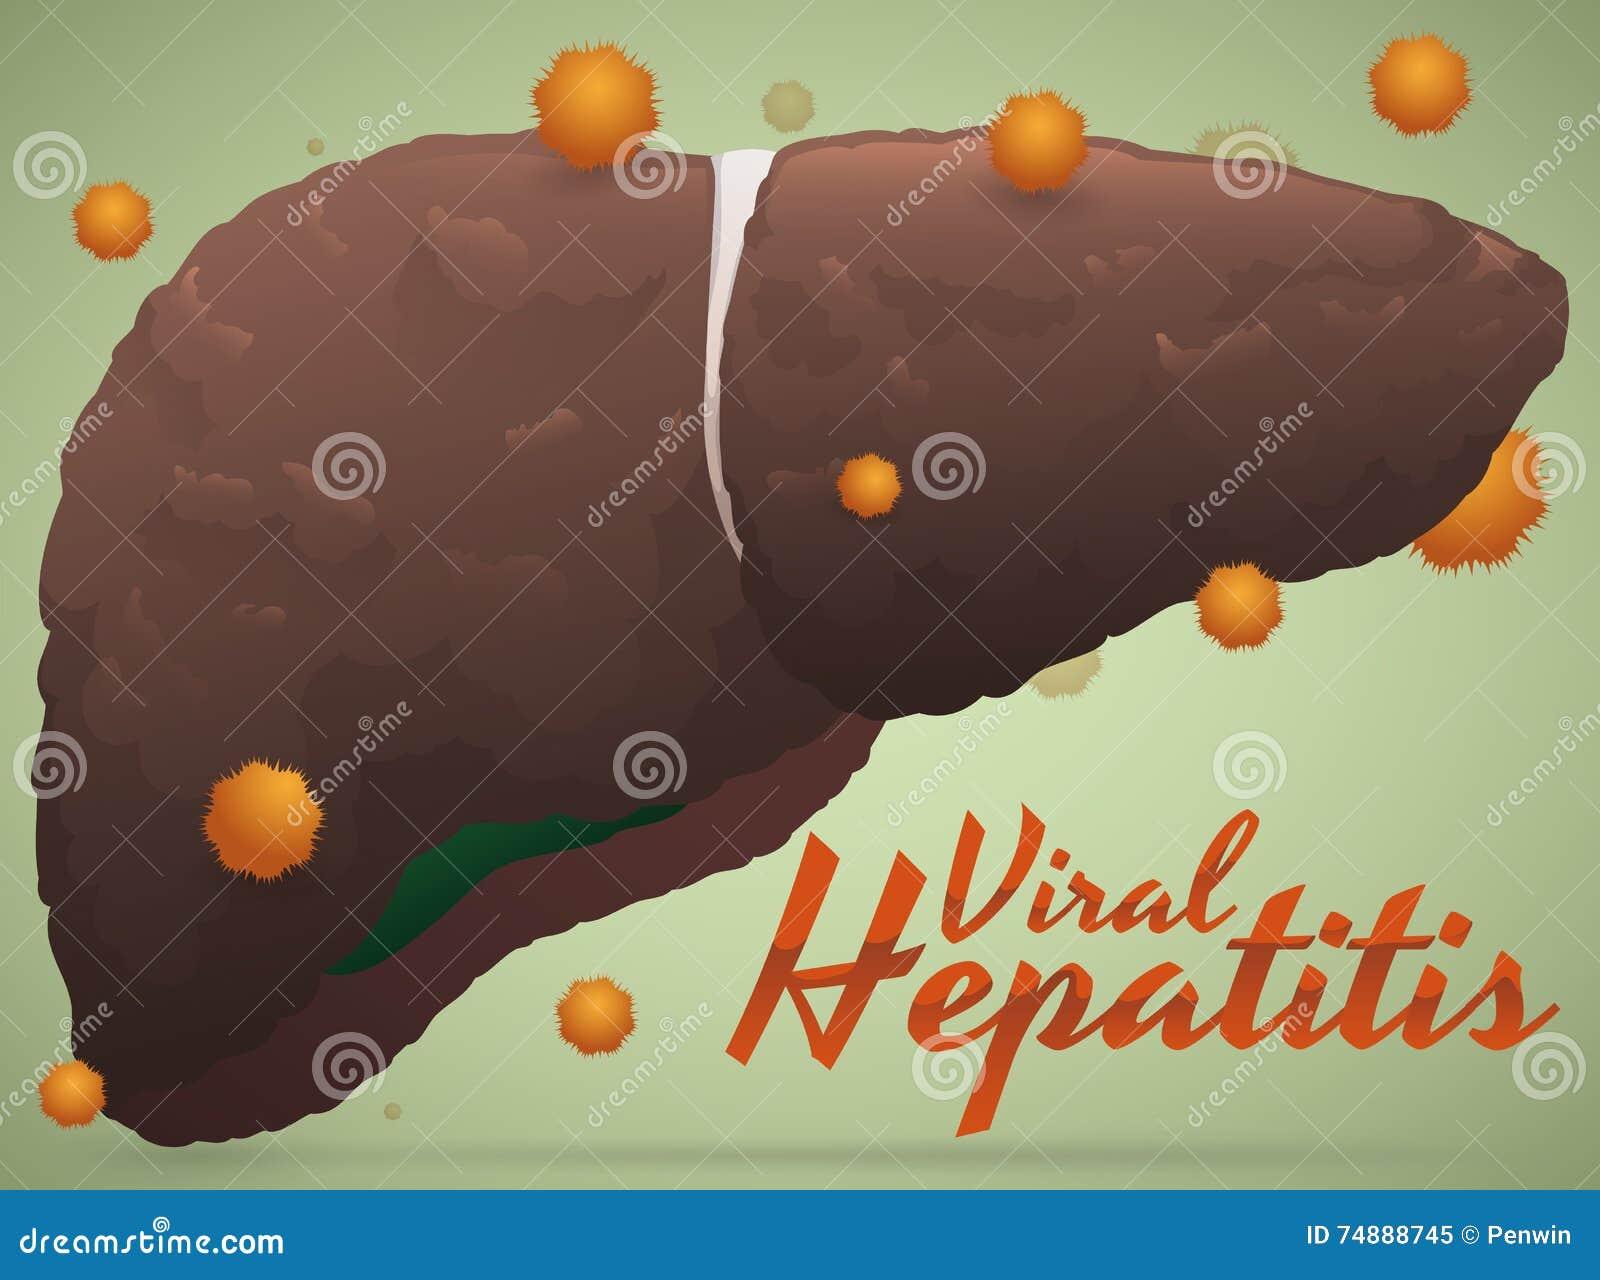 Krankes Leber-Ergebnis der Virushepatitis mit Virus um es, Vektor-Illustration